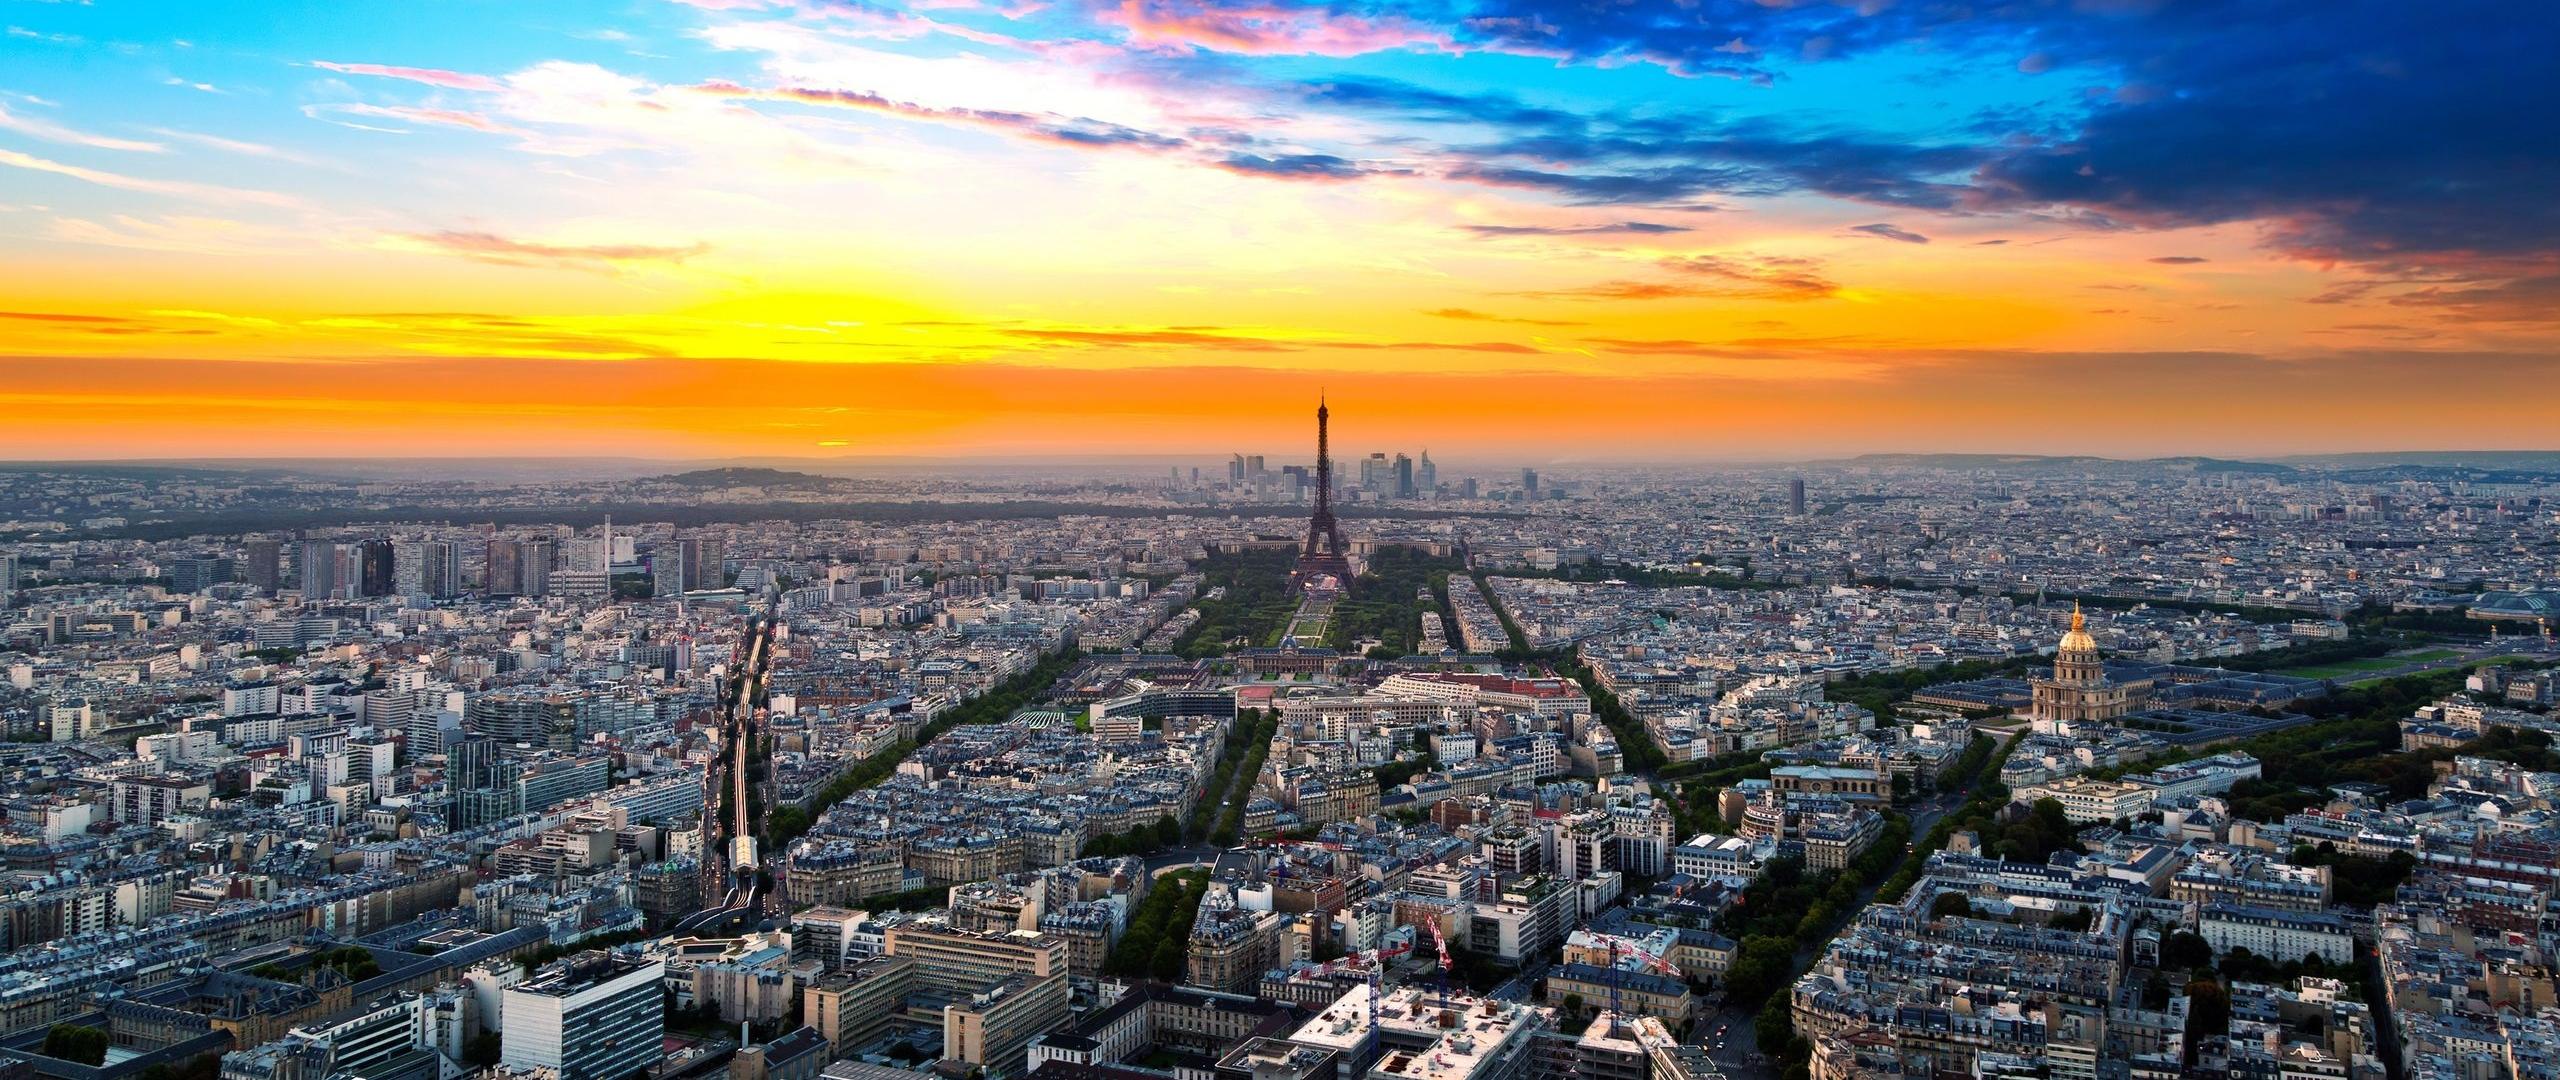 Wallpaper 2560x1080 Paris France Height City Sky 2560x1080 2560x1080